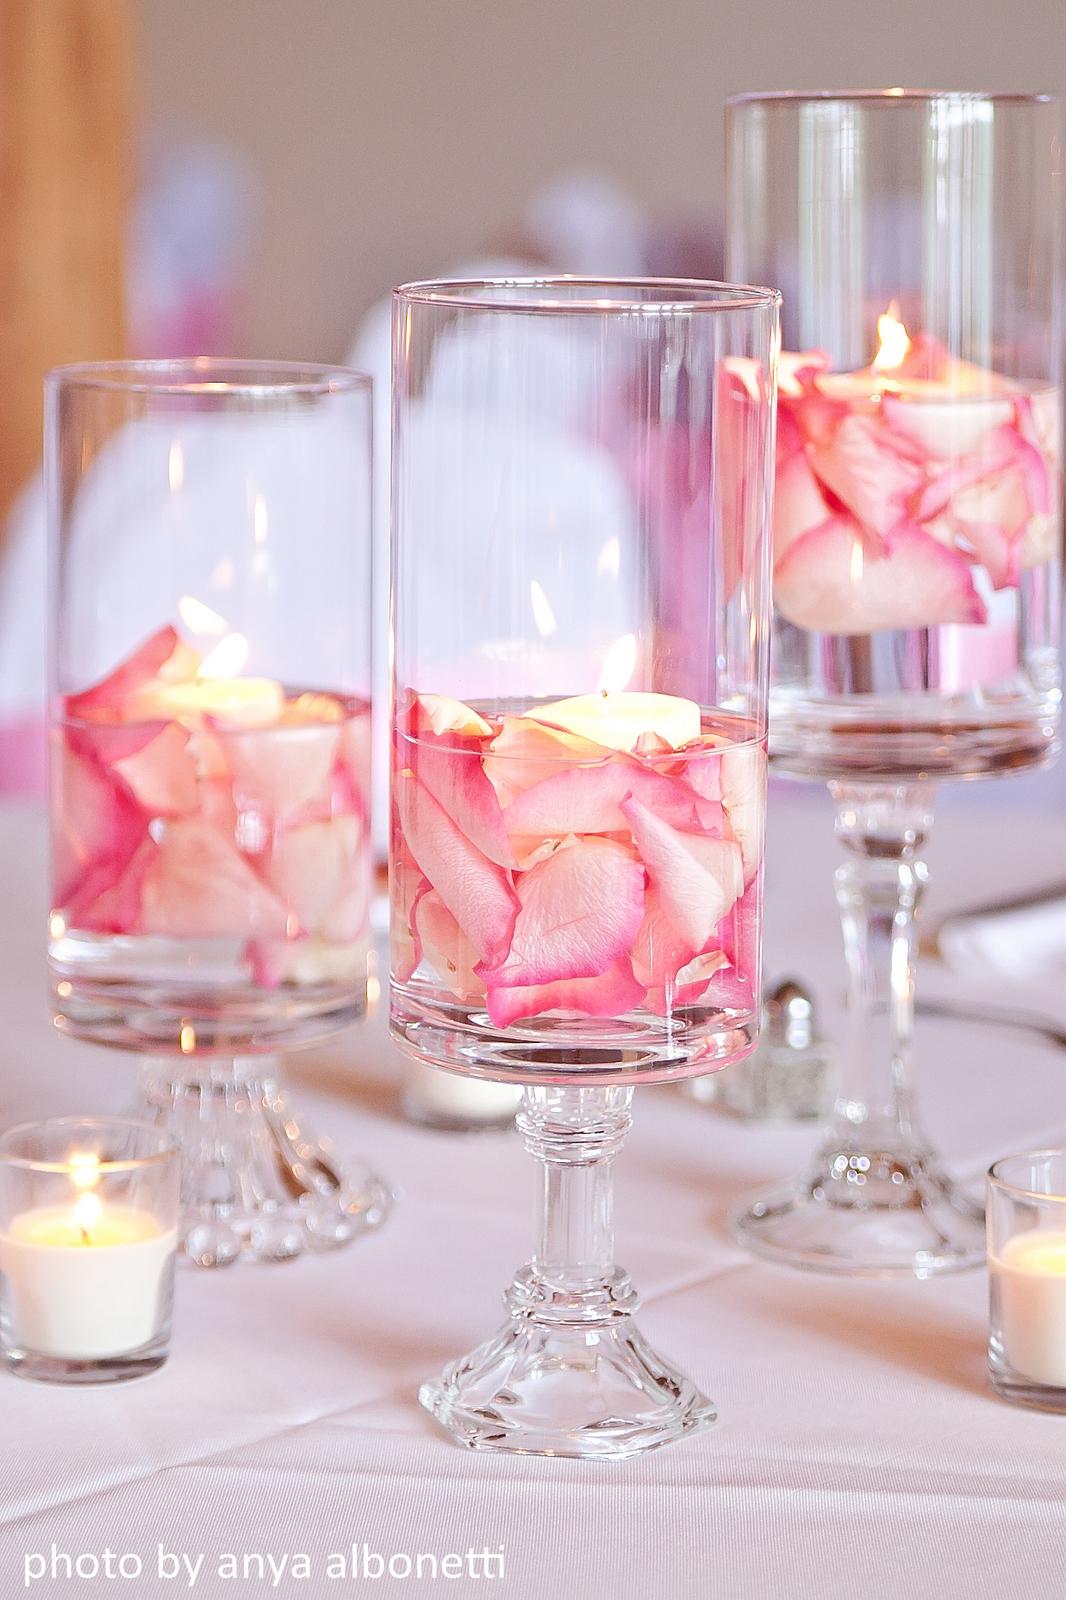 Simple diy table decorations - Our Wedding The Details Diy Wedding Centerpiecescenterpiece Ideaschristmas Centerpiecessimple Centerpieceseasy Table